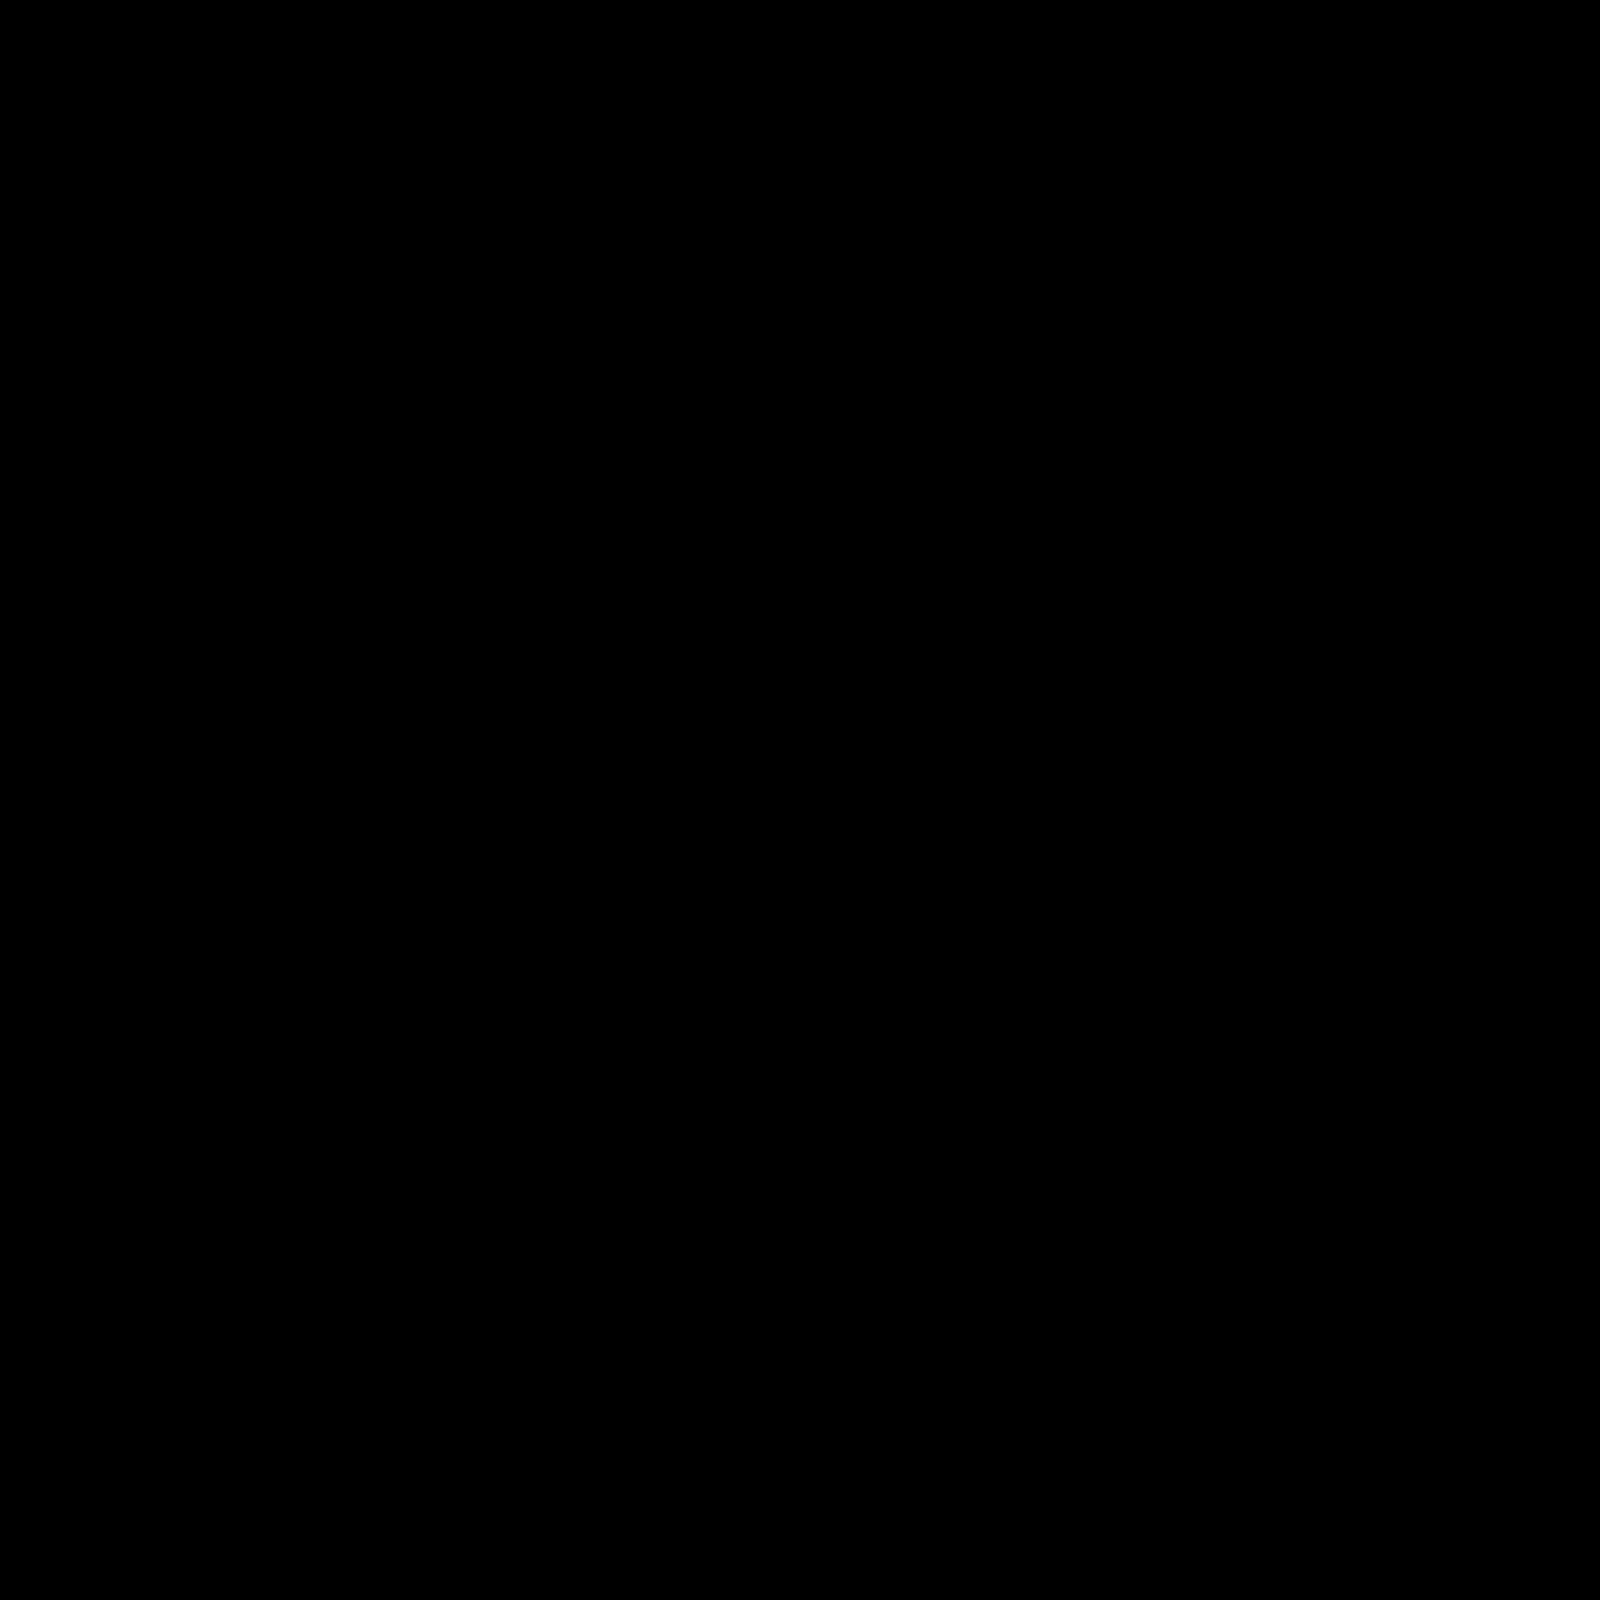 Orangensaft icon